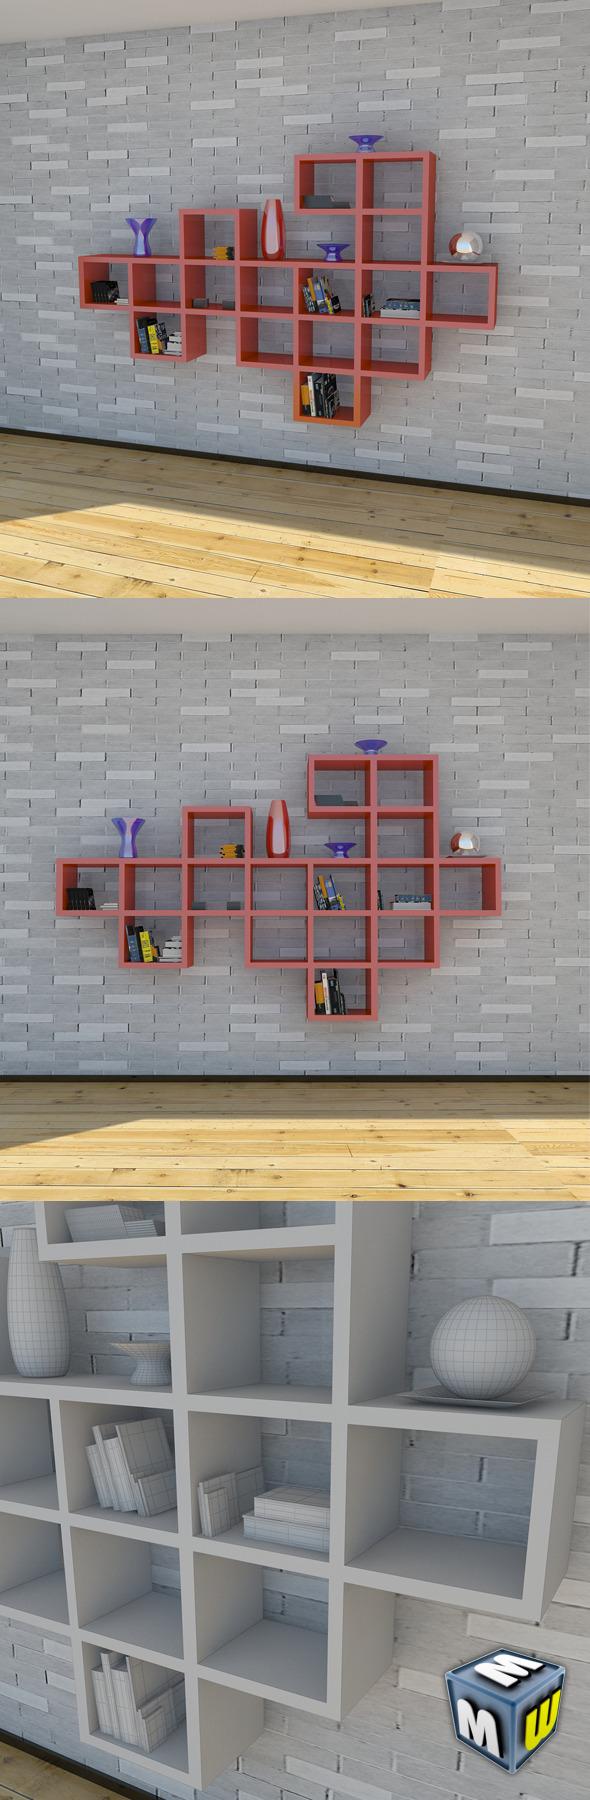 3DOcean Bookshelf 2 MAX 2011 5003836